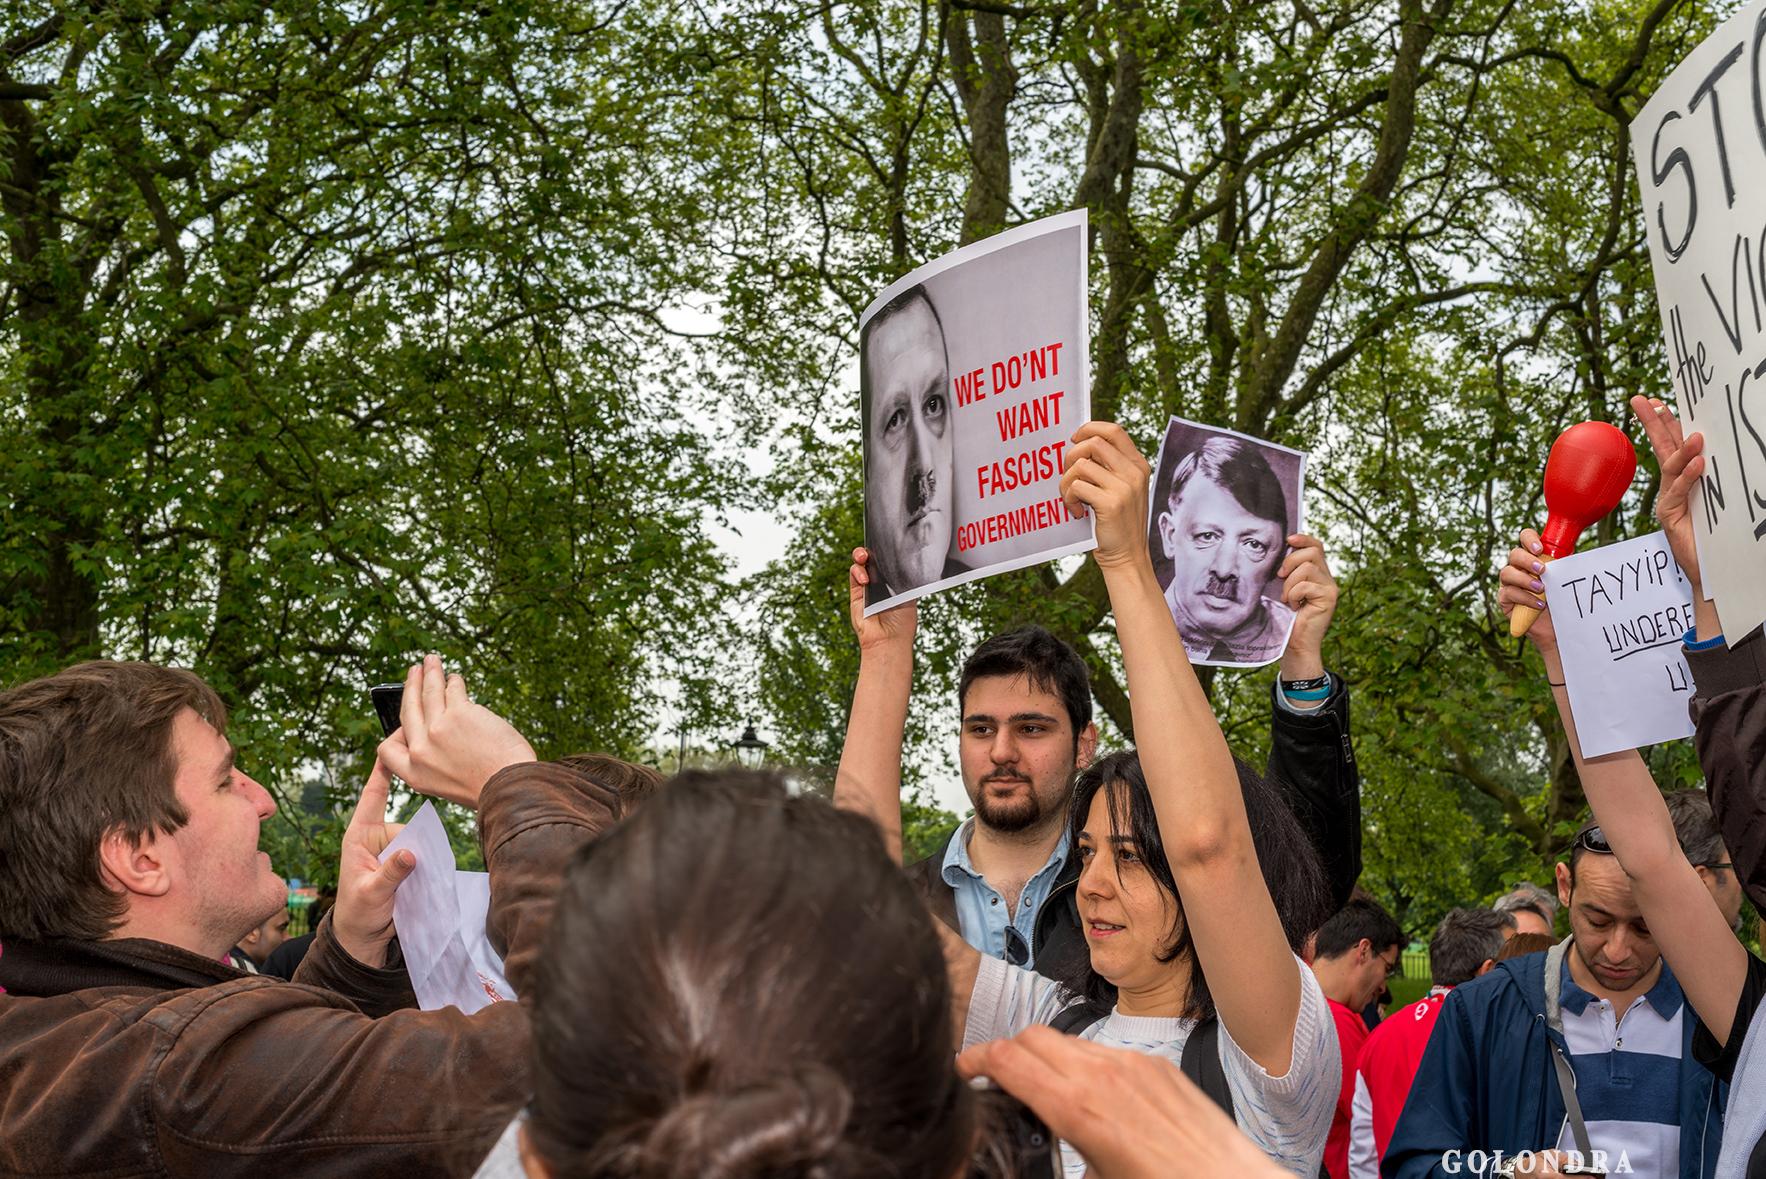 Protesting Turkish Government - Turk Hukumetini Protesto - Londra - London (13)